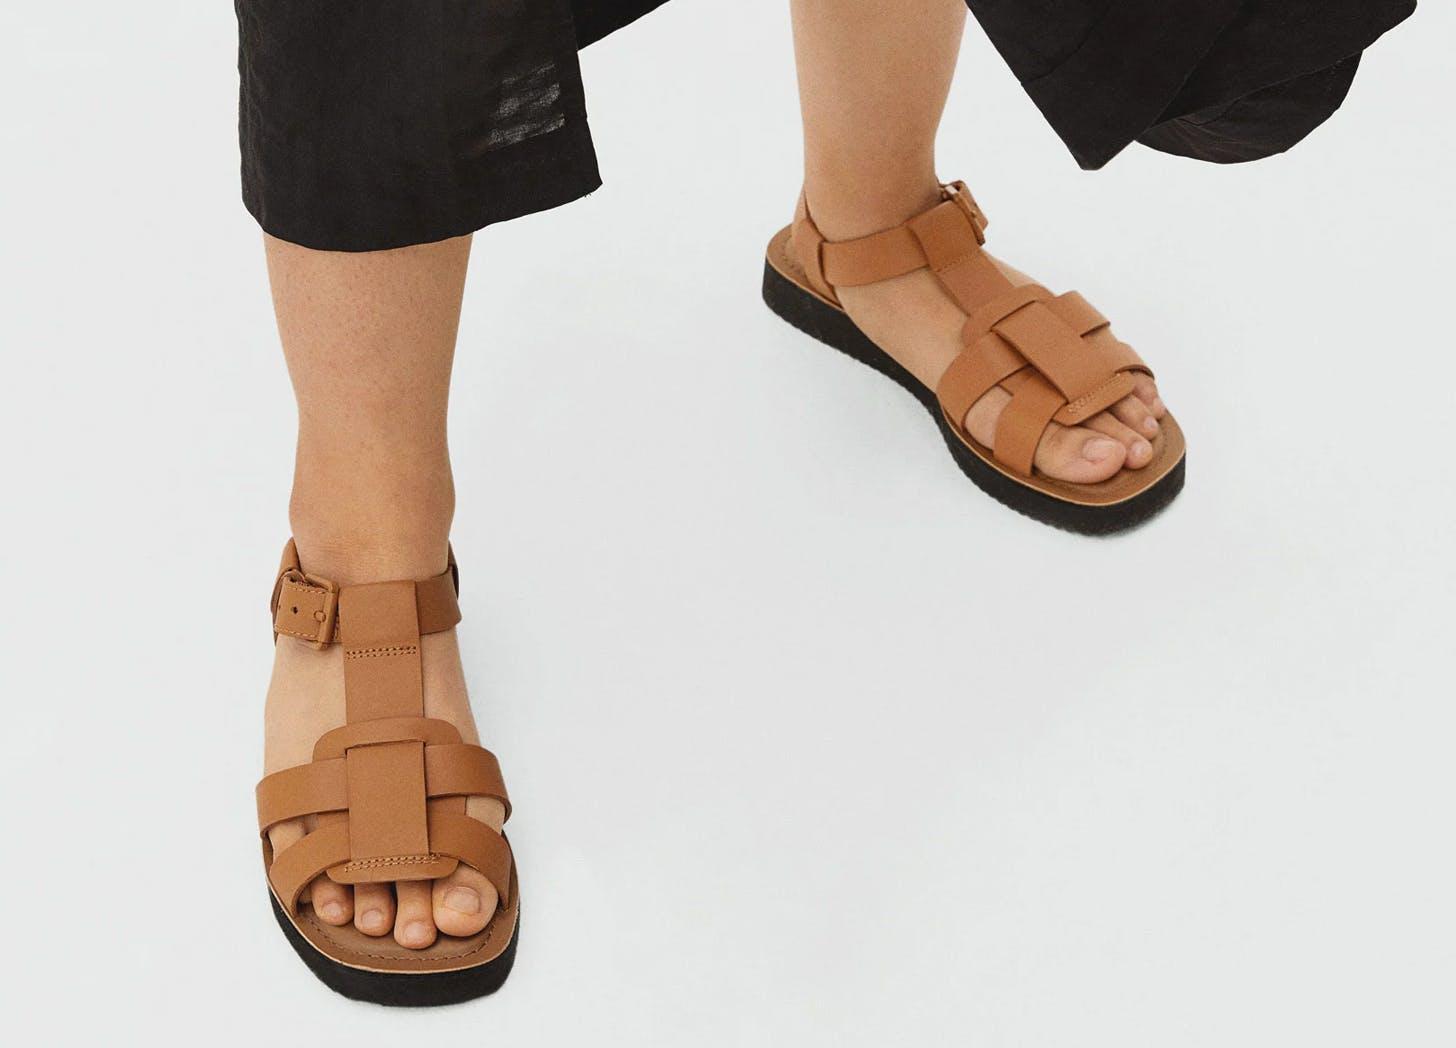 everlane fisherman sandals